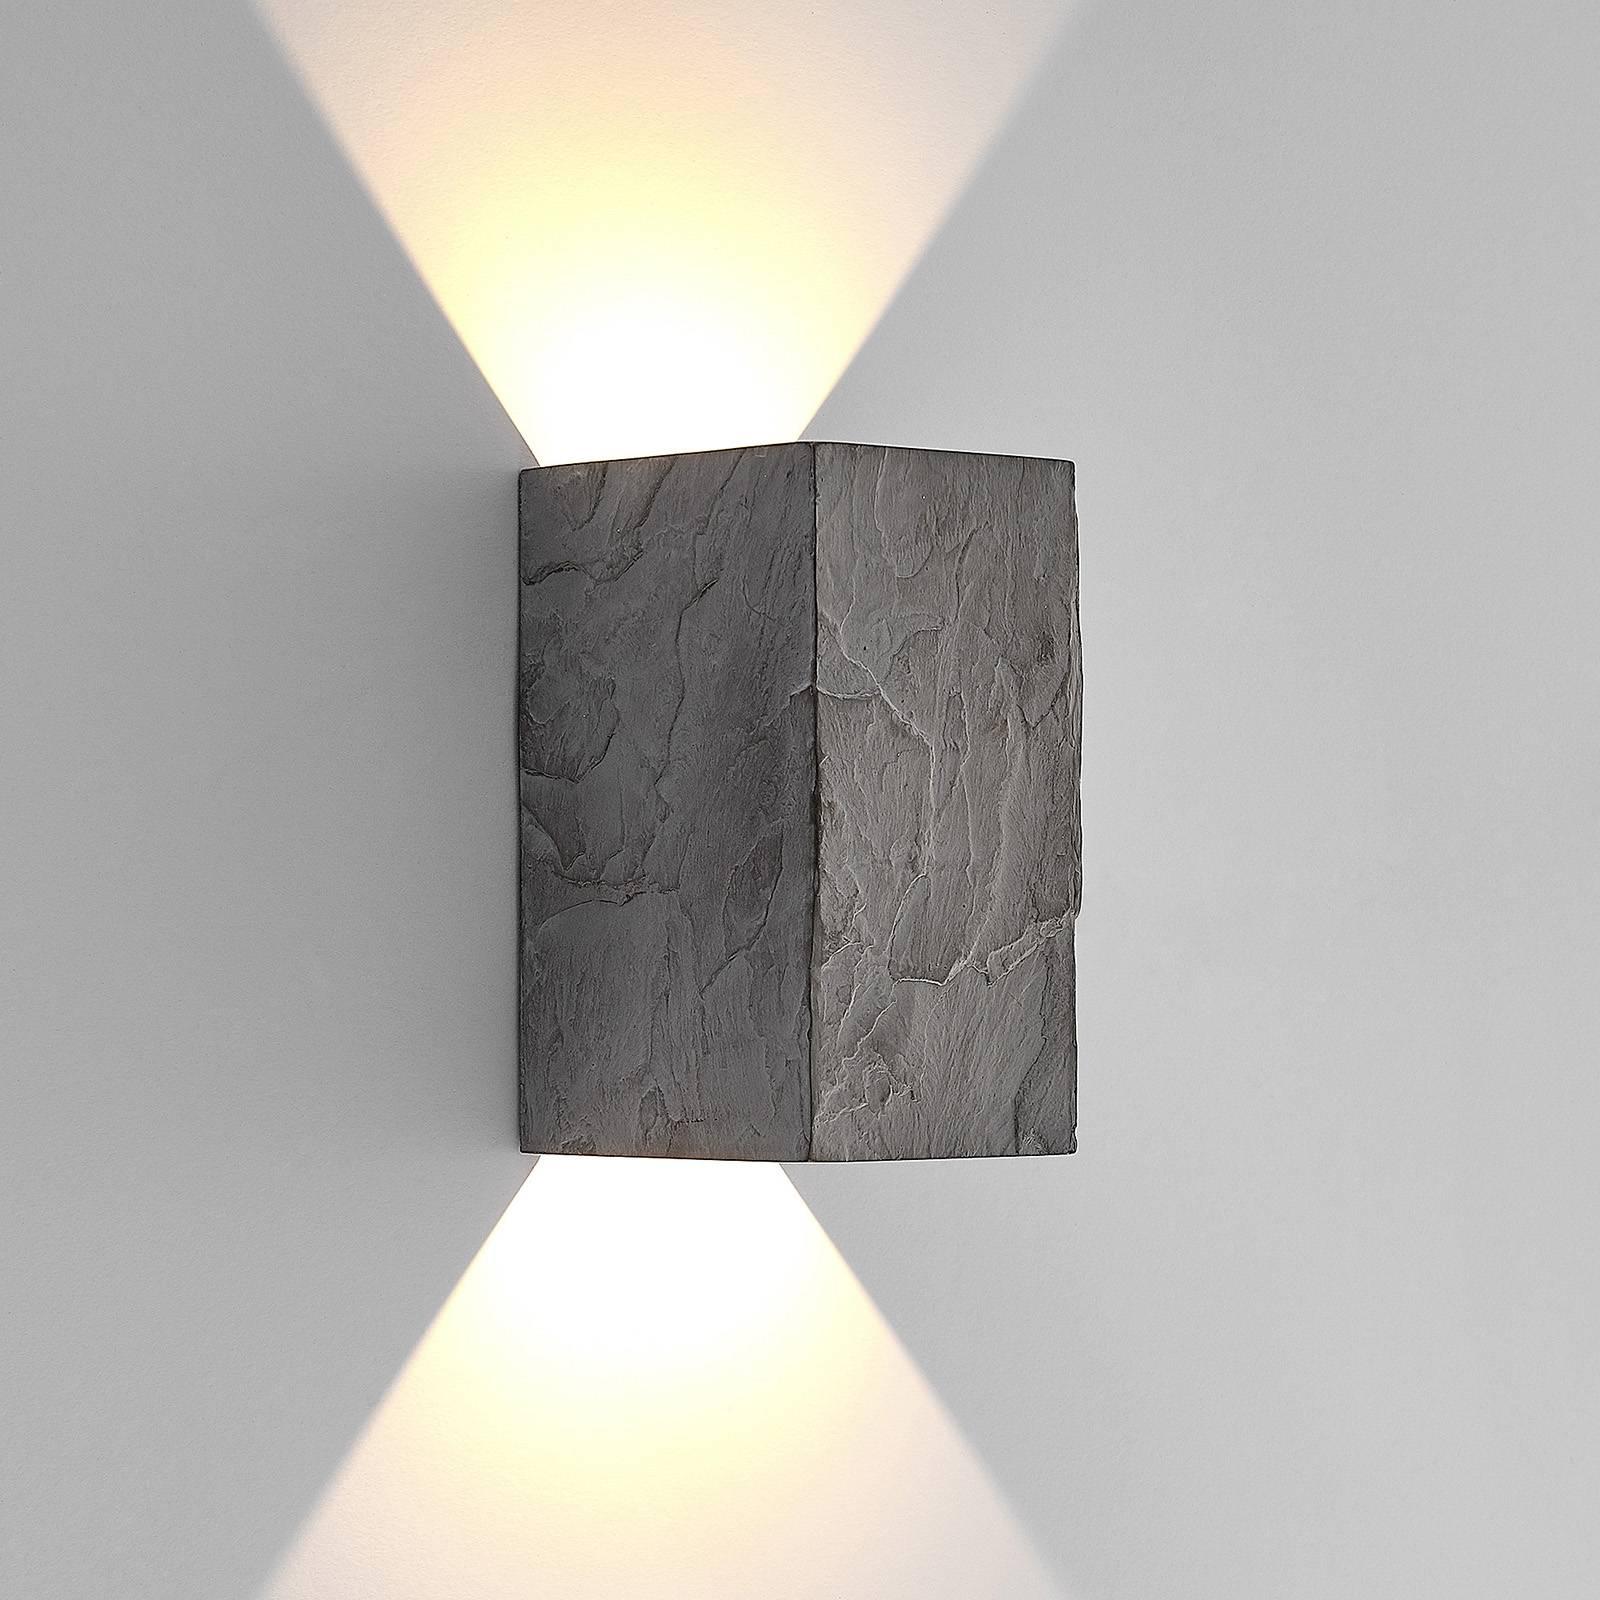 Lucande Vigga -LED-ulkoseinälamppu, liuskekivi